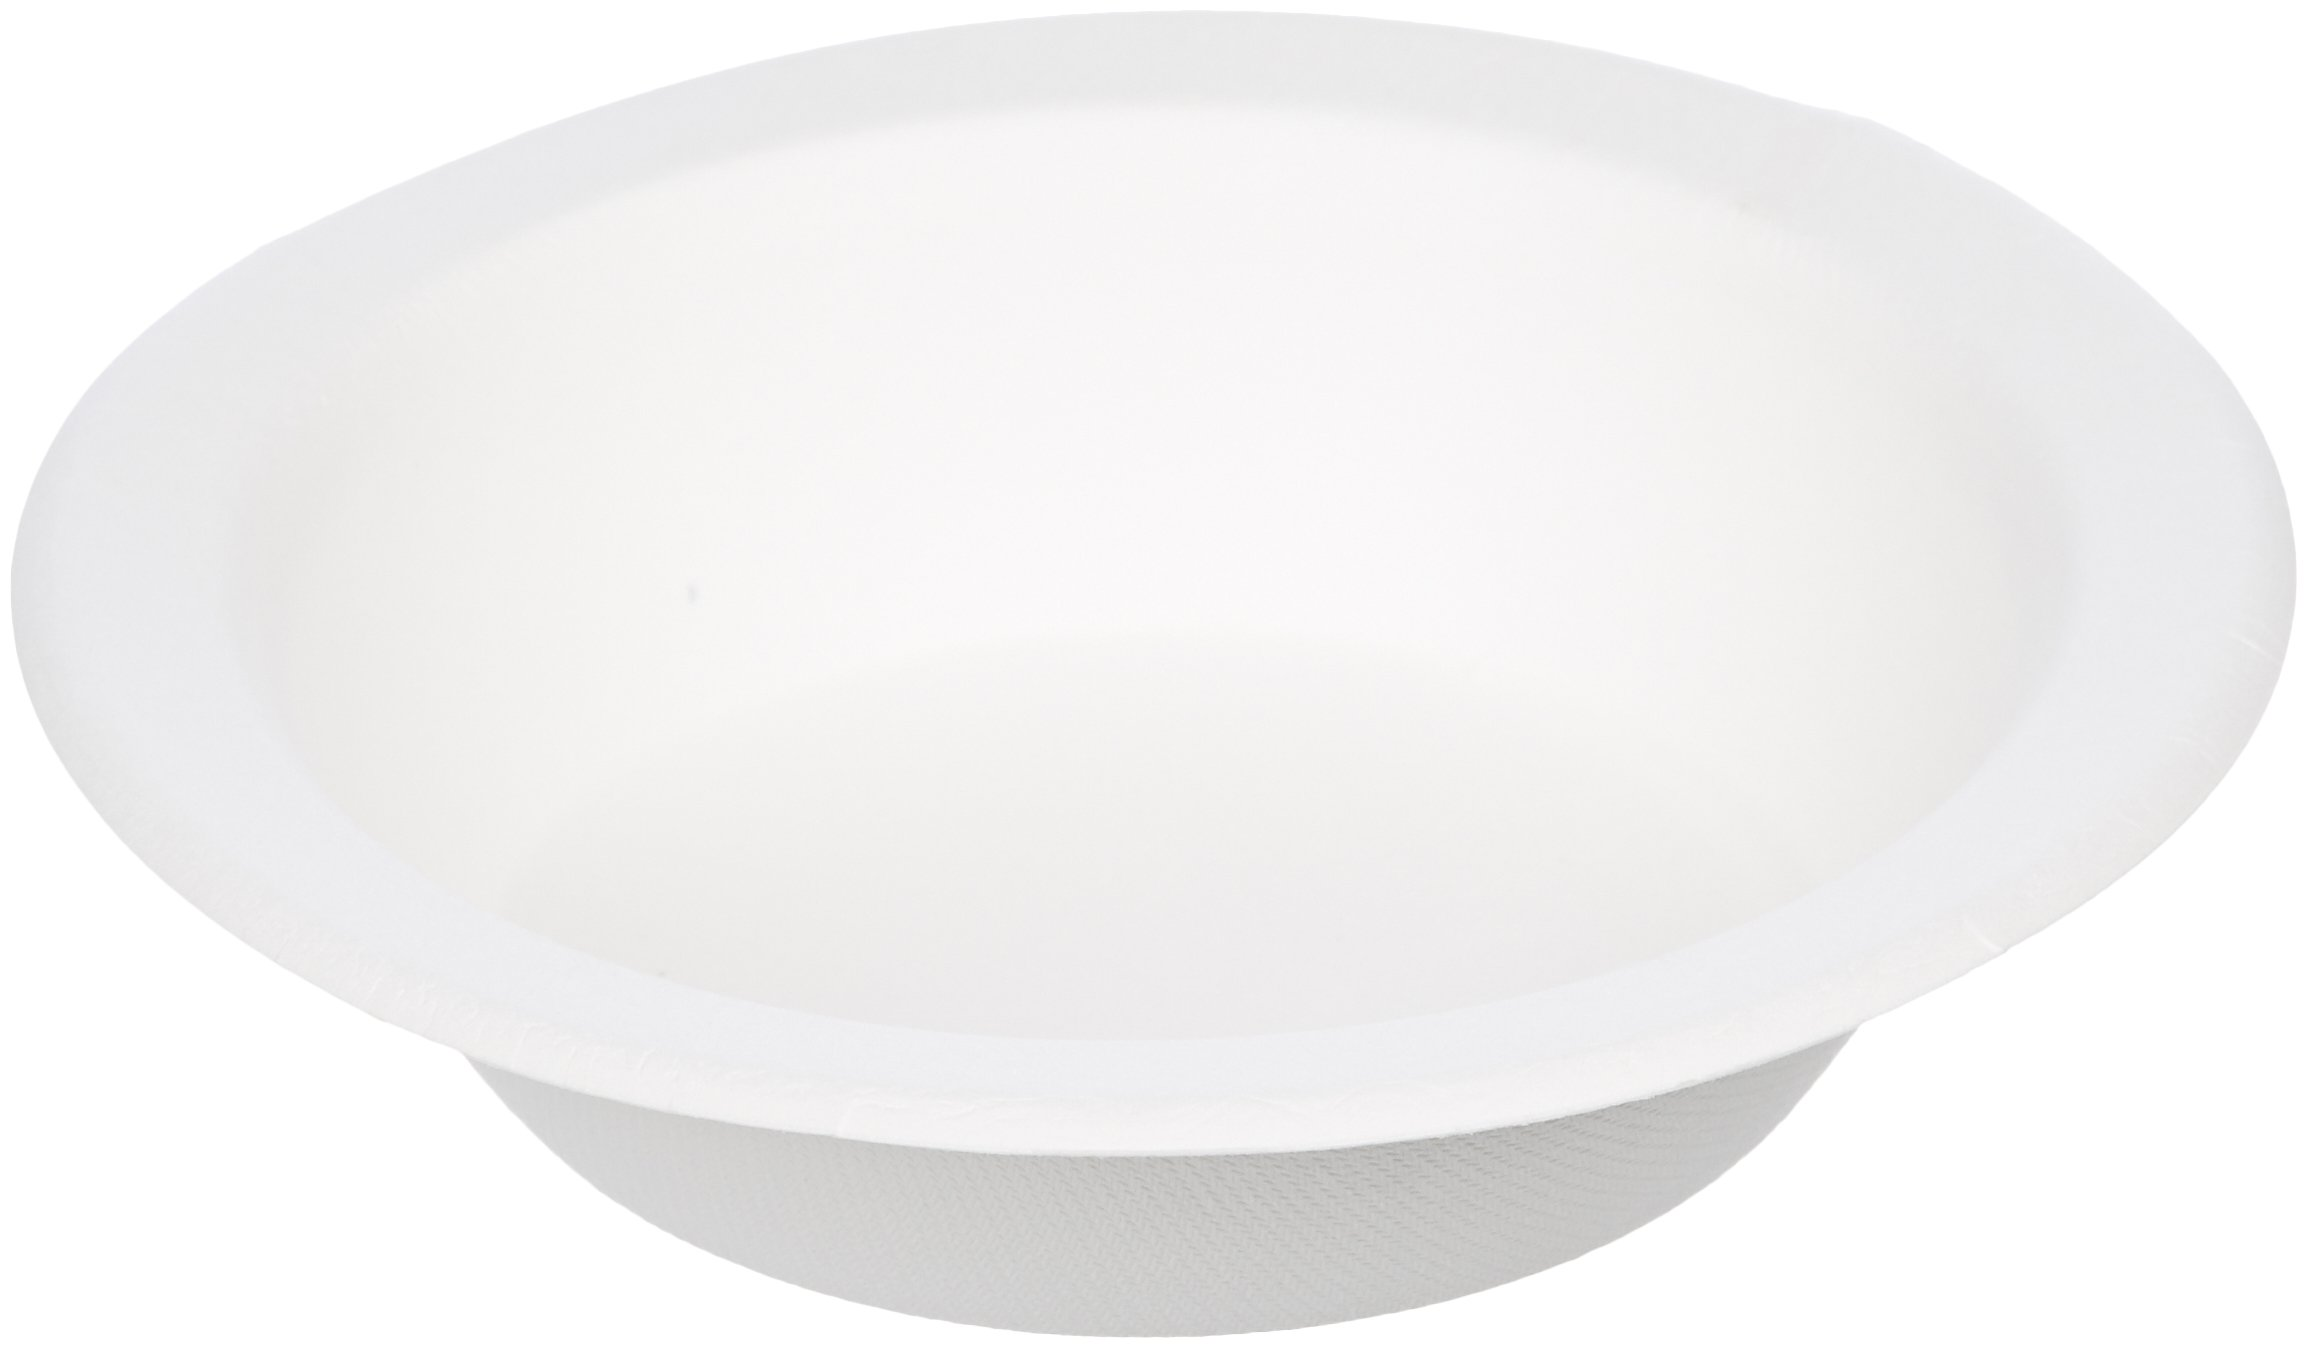 AmazonBasics 16 oz. Compostable Soup Bowls, 1,000-Count